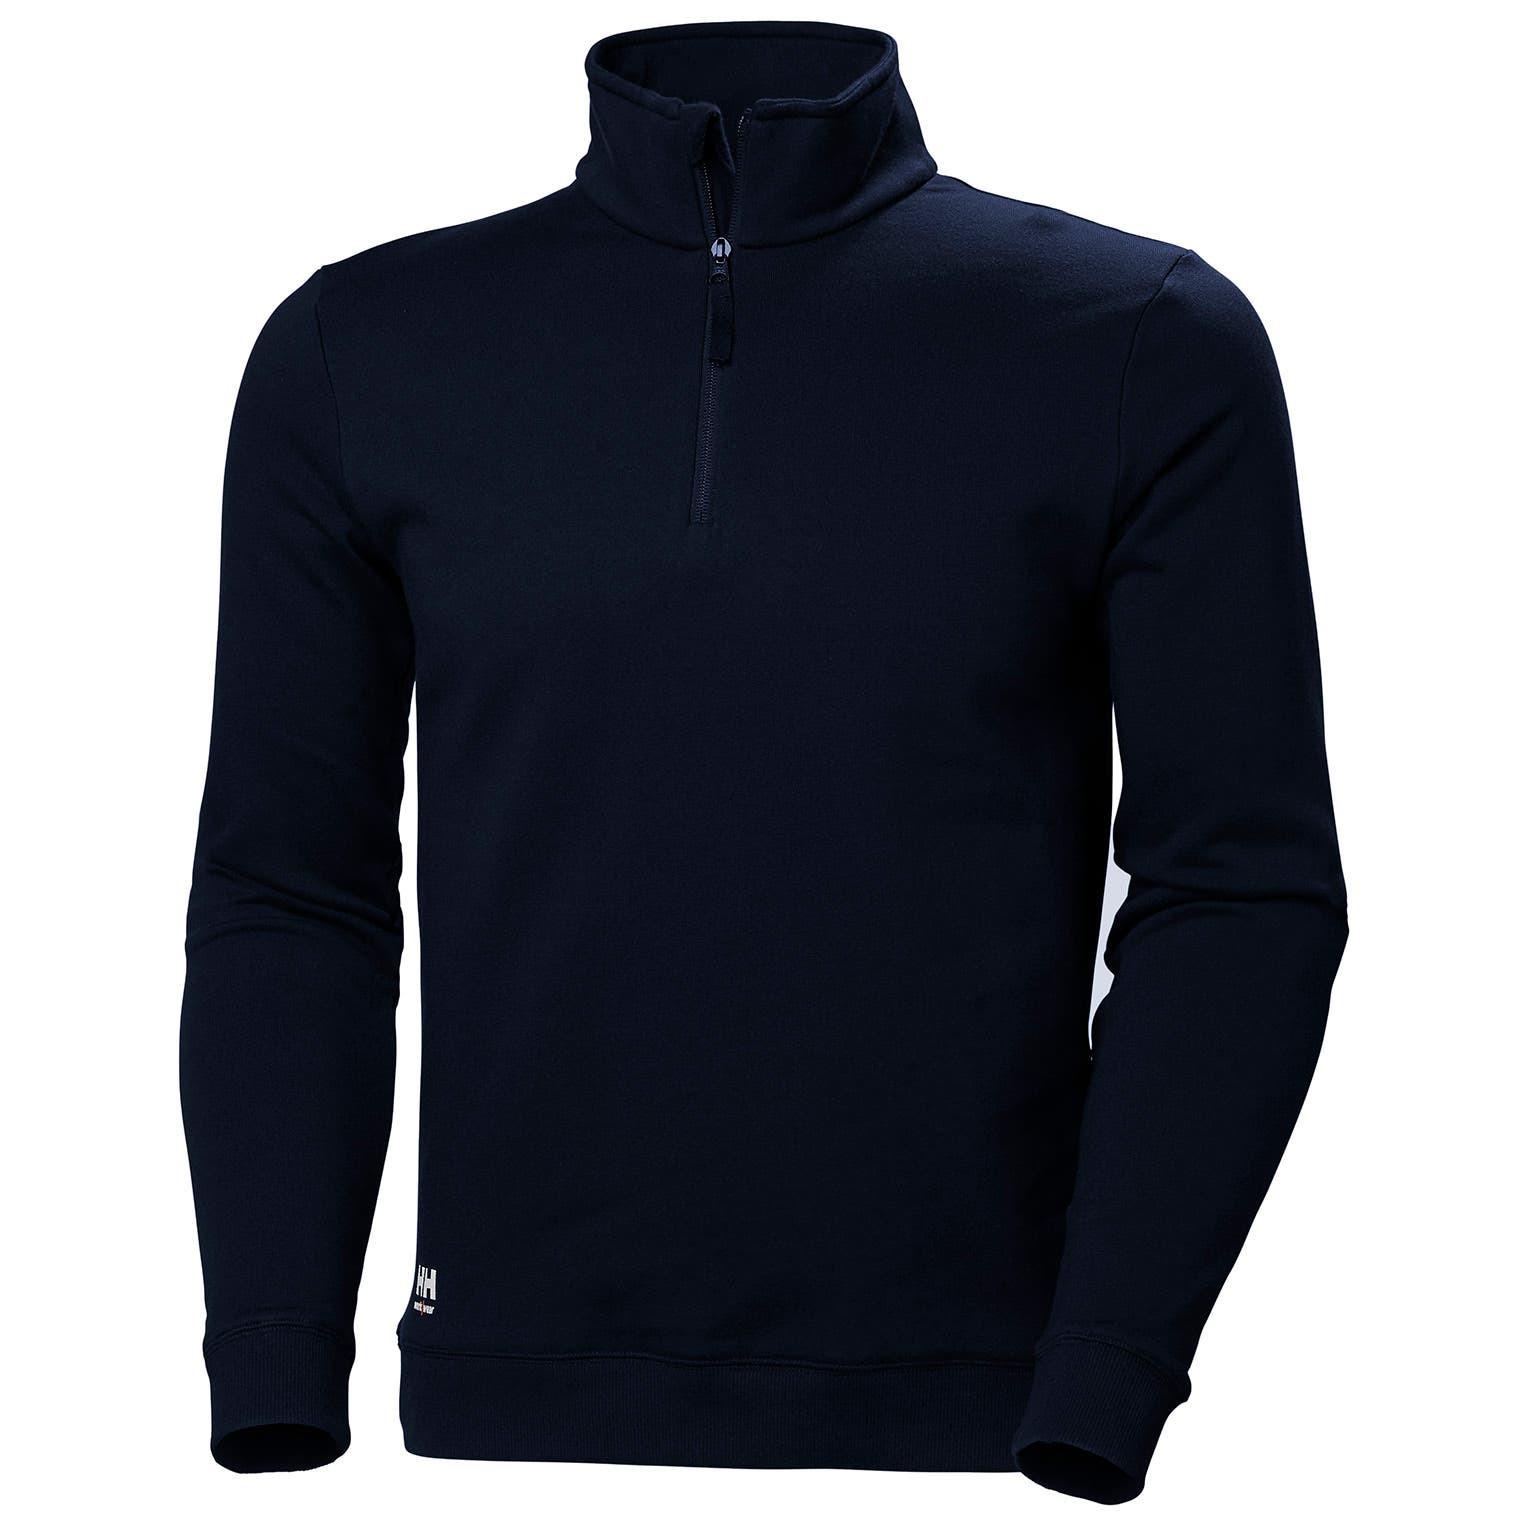 Свитшот на молнии Helly Hansen Manchester HZ Sweatshirt - 79210 (Navy; L)